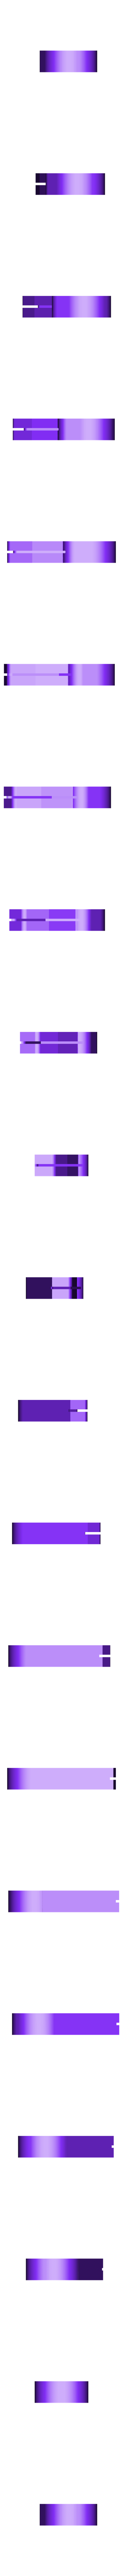 RAMBO_FISHING_KIT_BLADE_HOLDER.stl Télécharger fichier STL gratuit RAMBO PÊCHE KIT (Mussy Design) • Modèle imprimable en 3D, MuSSy